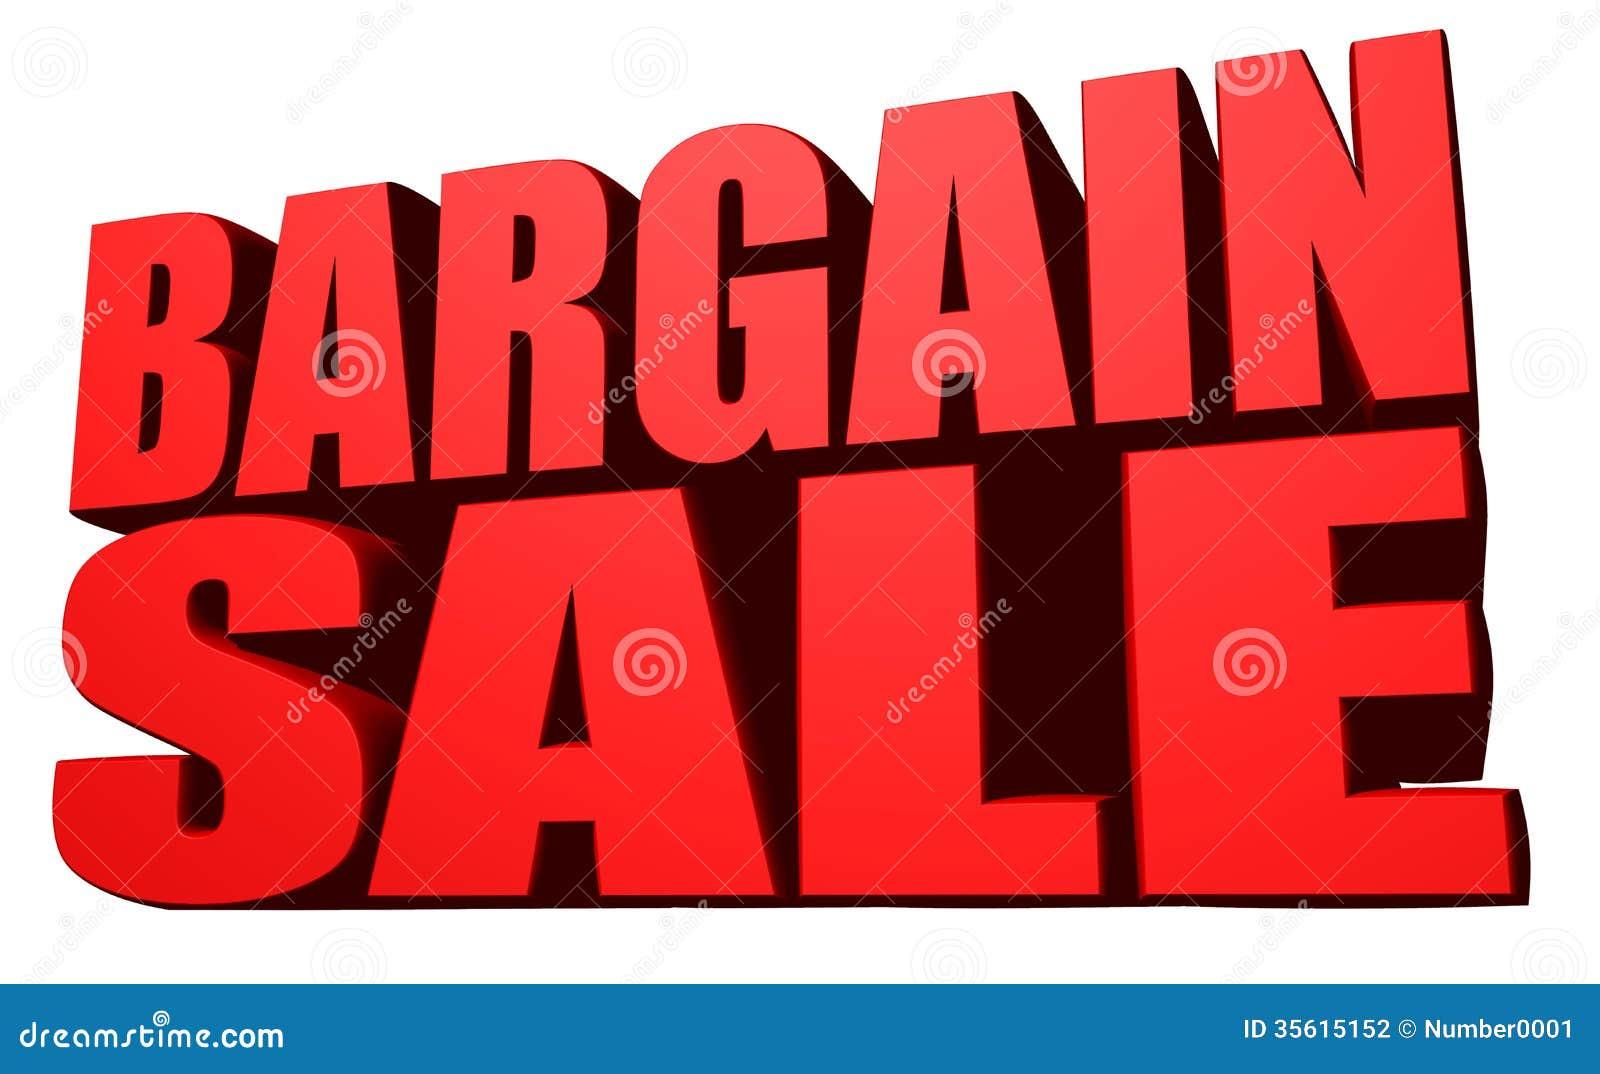 Bargain Sale Stock Photography Image 35615152